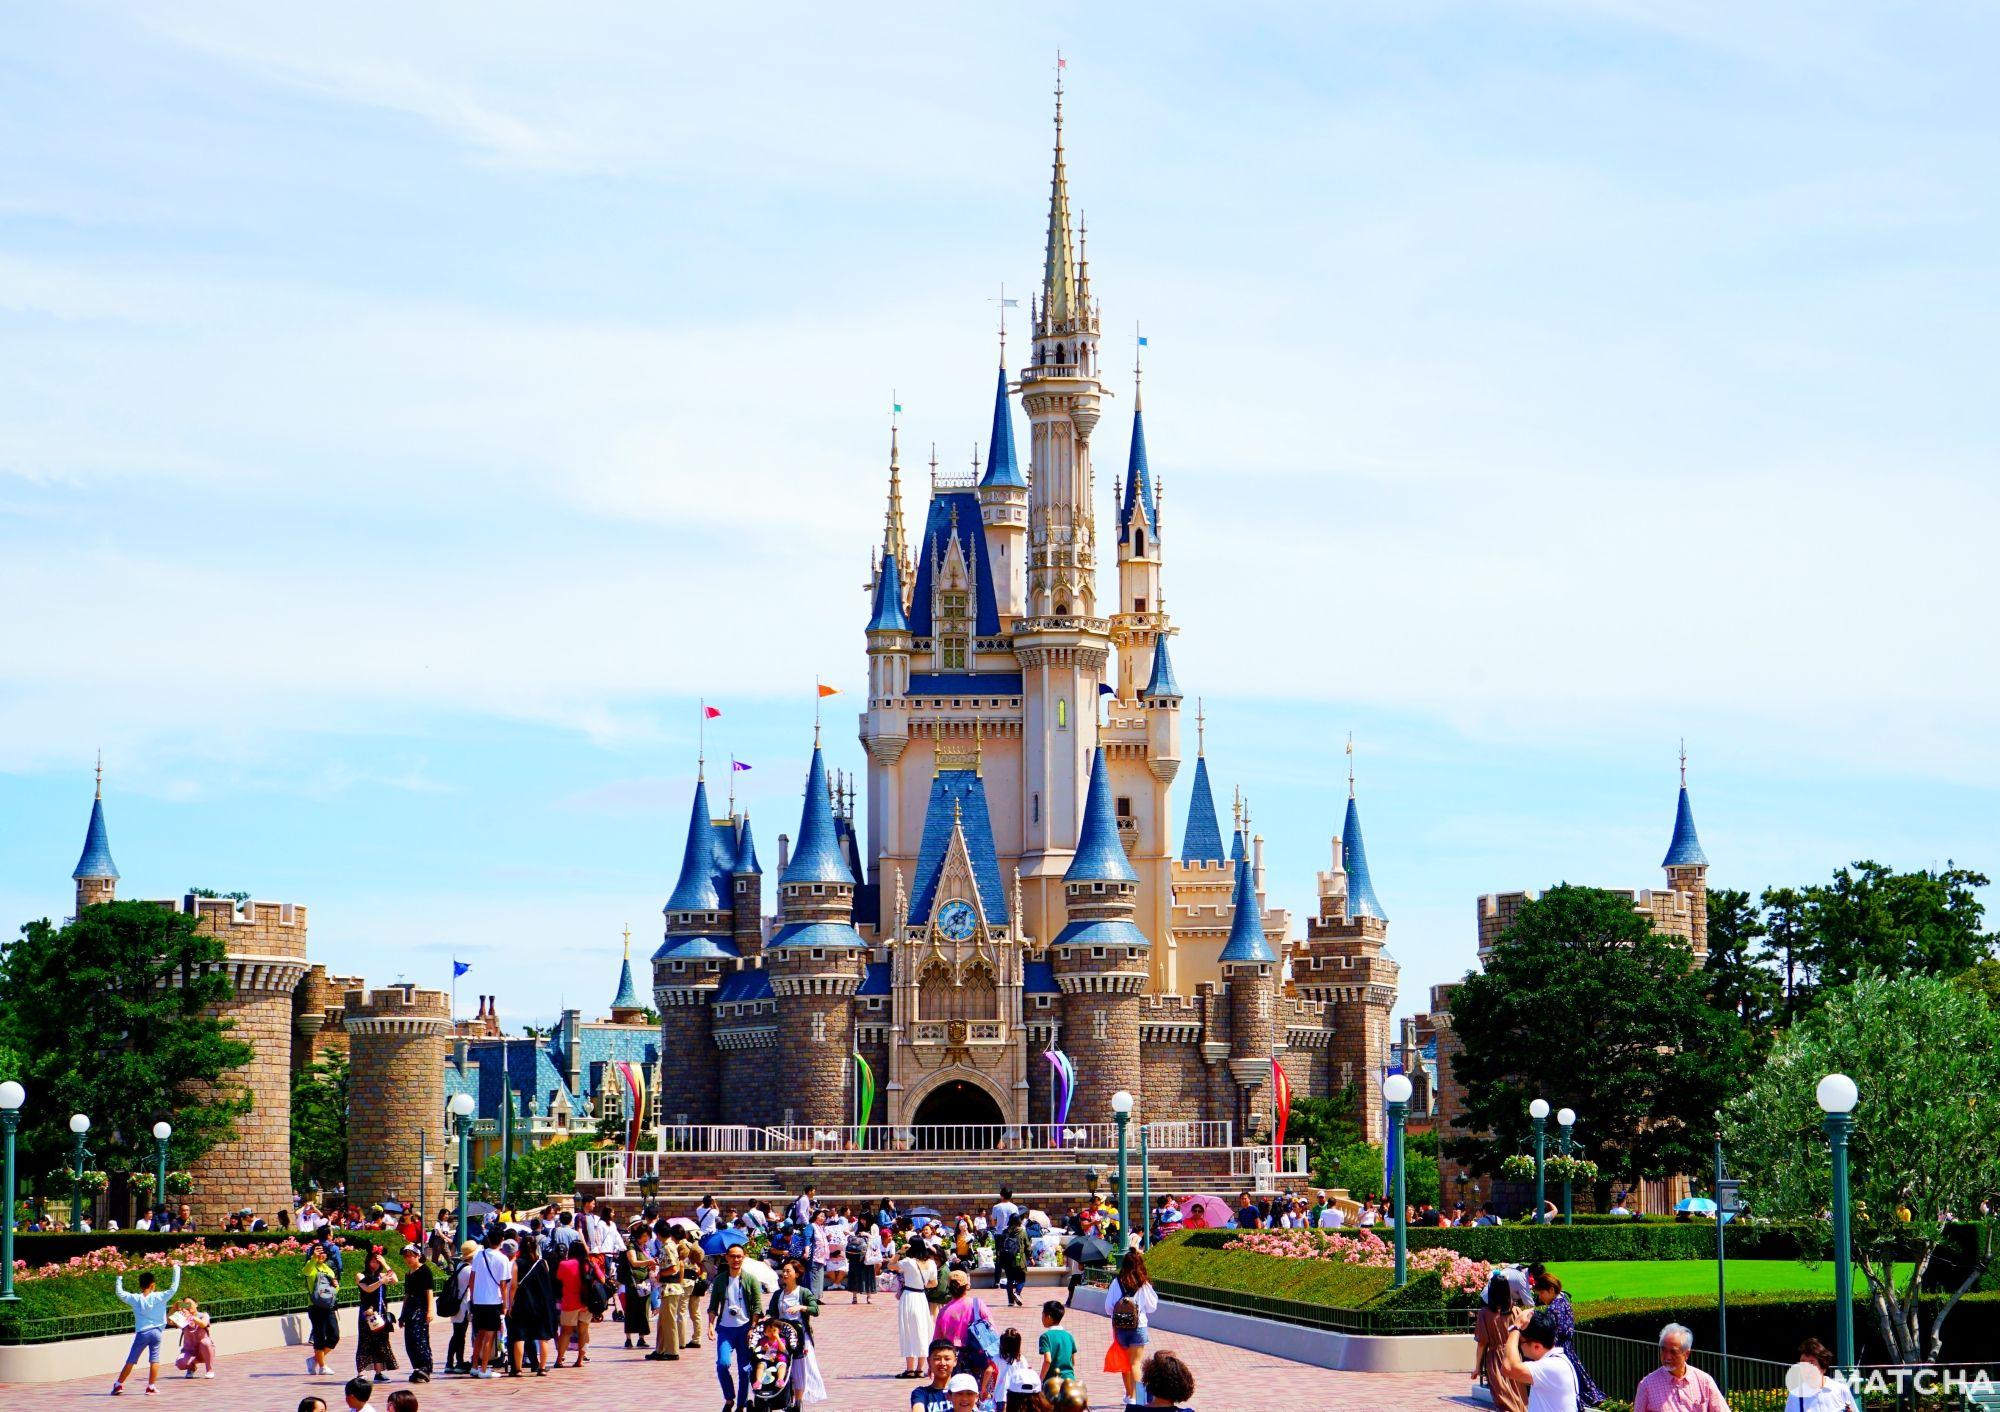 Tokyo Disneyland Summer 2019 Shows Food And Shopping Guide Matcha Japan Travel Web Magazine